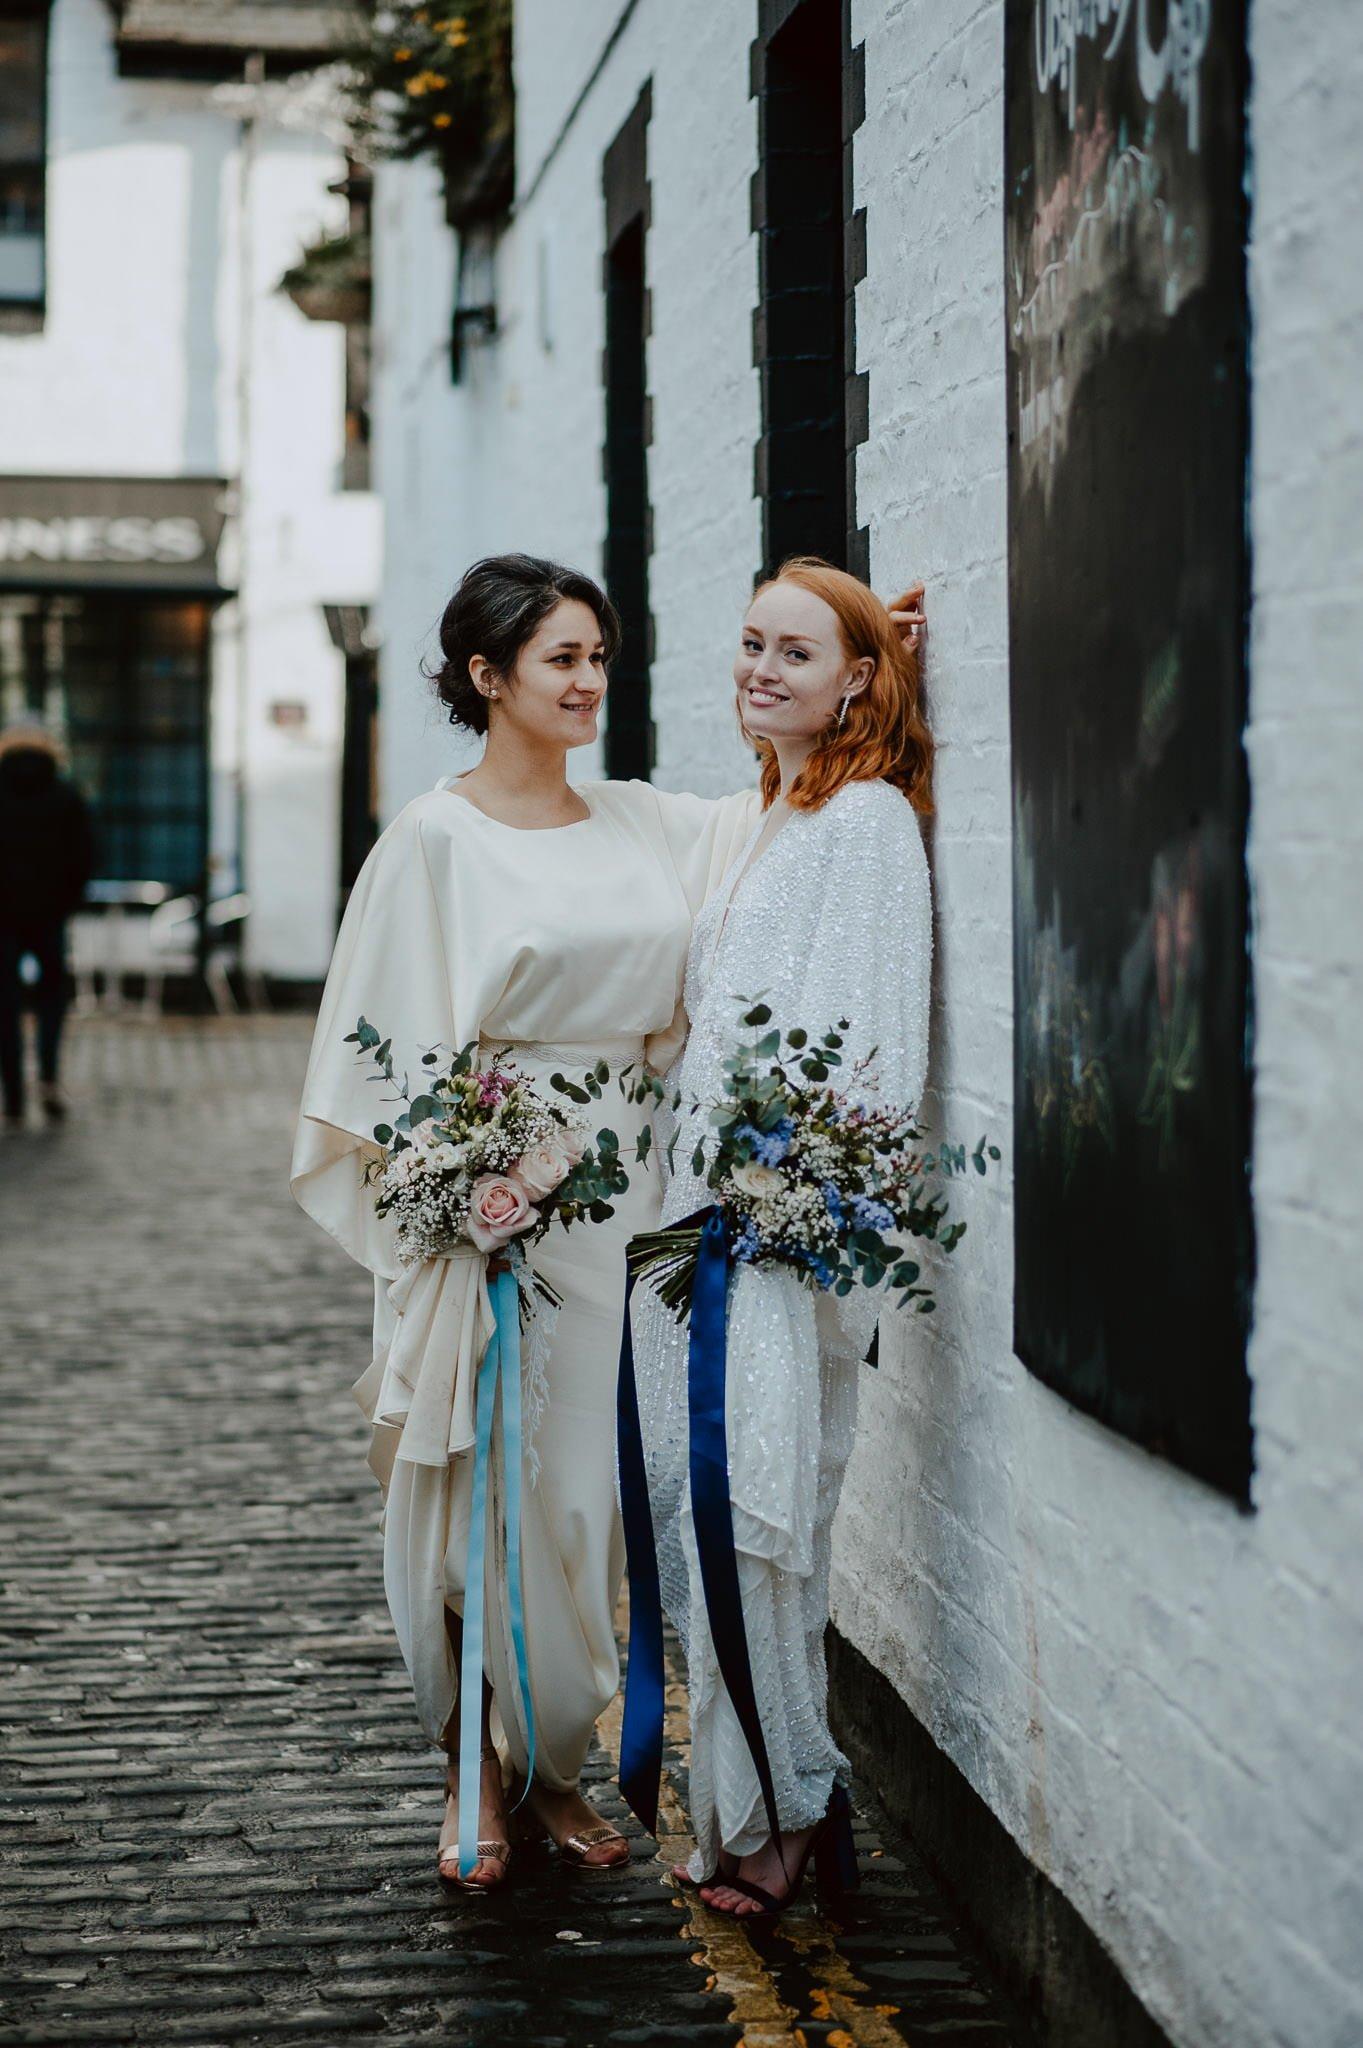 A Dreamy Pre-Raphaelite Wedding at the Bothy in Glasgow 37